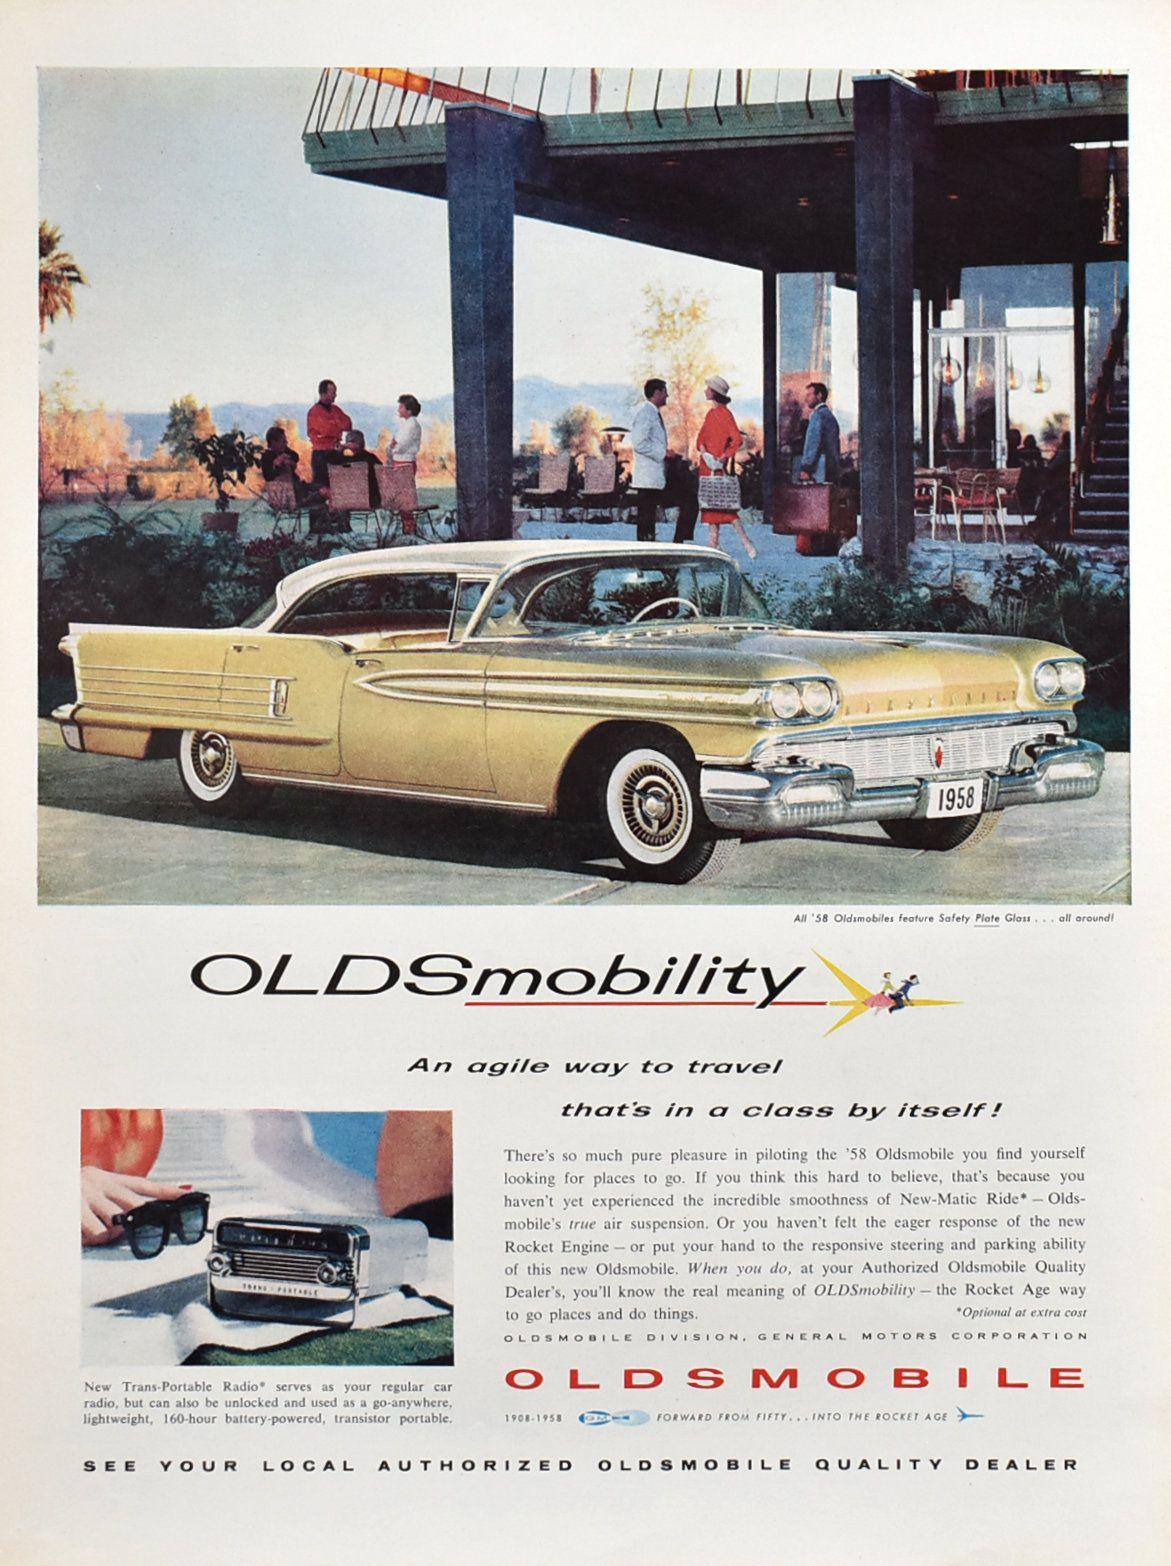 1958 Oldsmobile 2-Door Hardtop Ad – 50s Garage Decor – Gift for Car Buff – Johns Manville Ad